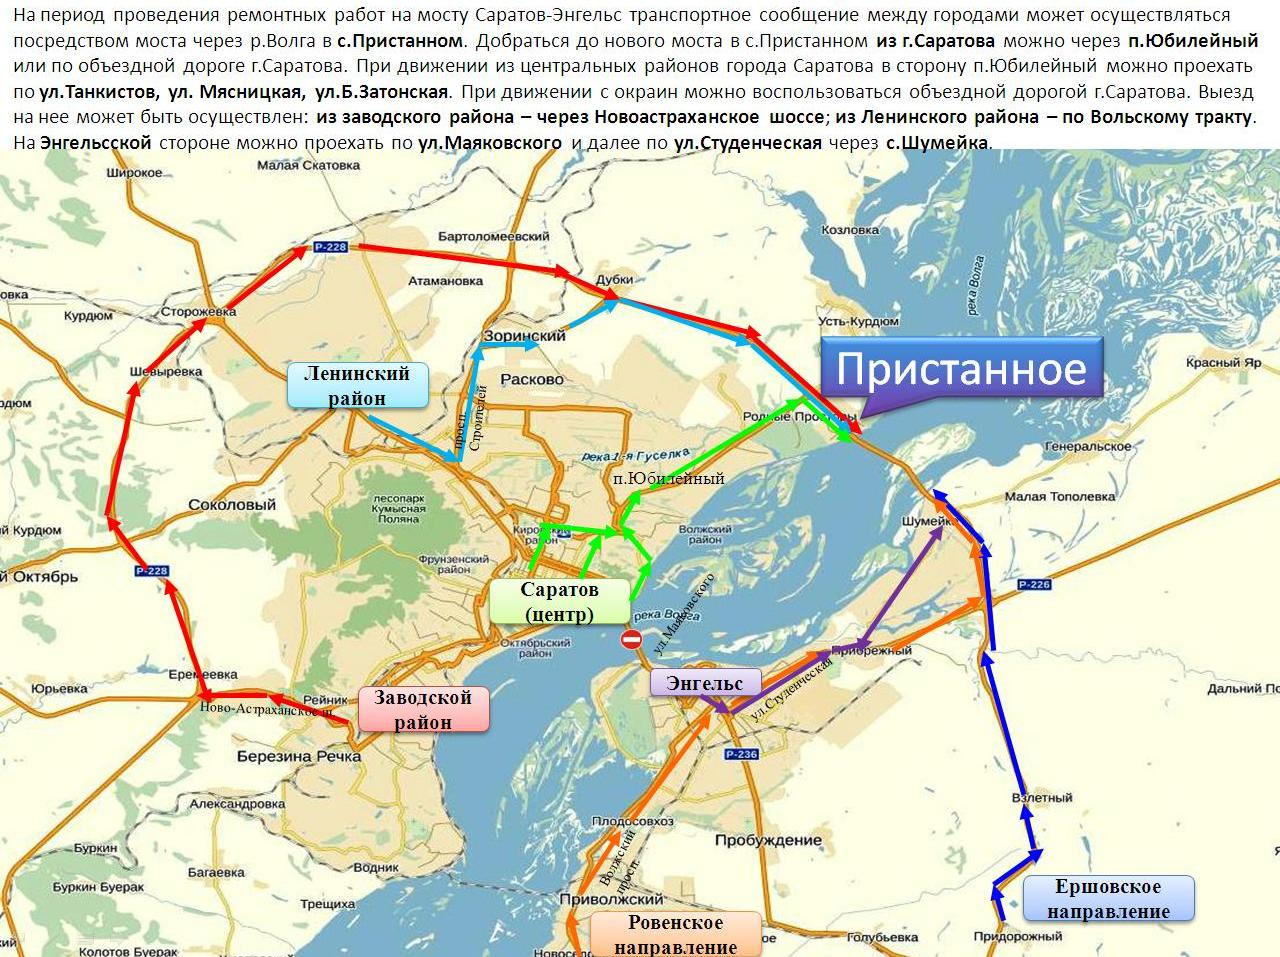 https://www.saratovnews.ru/i/upload/images/1.JPG